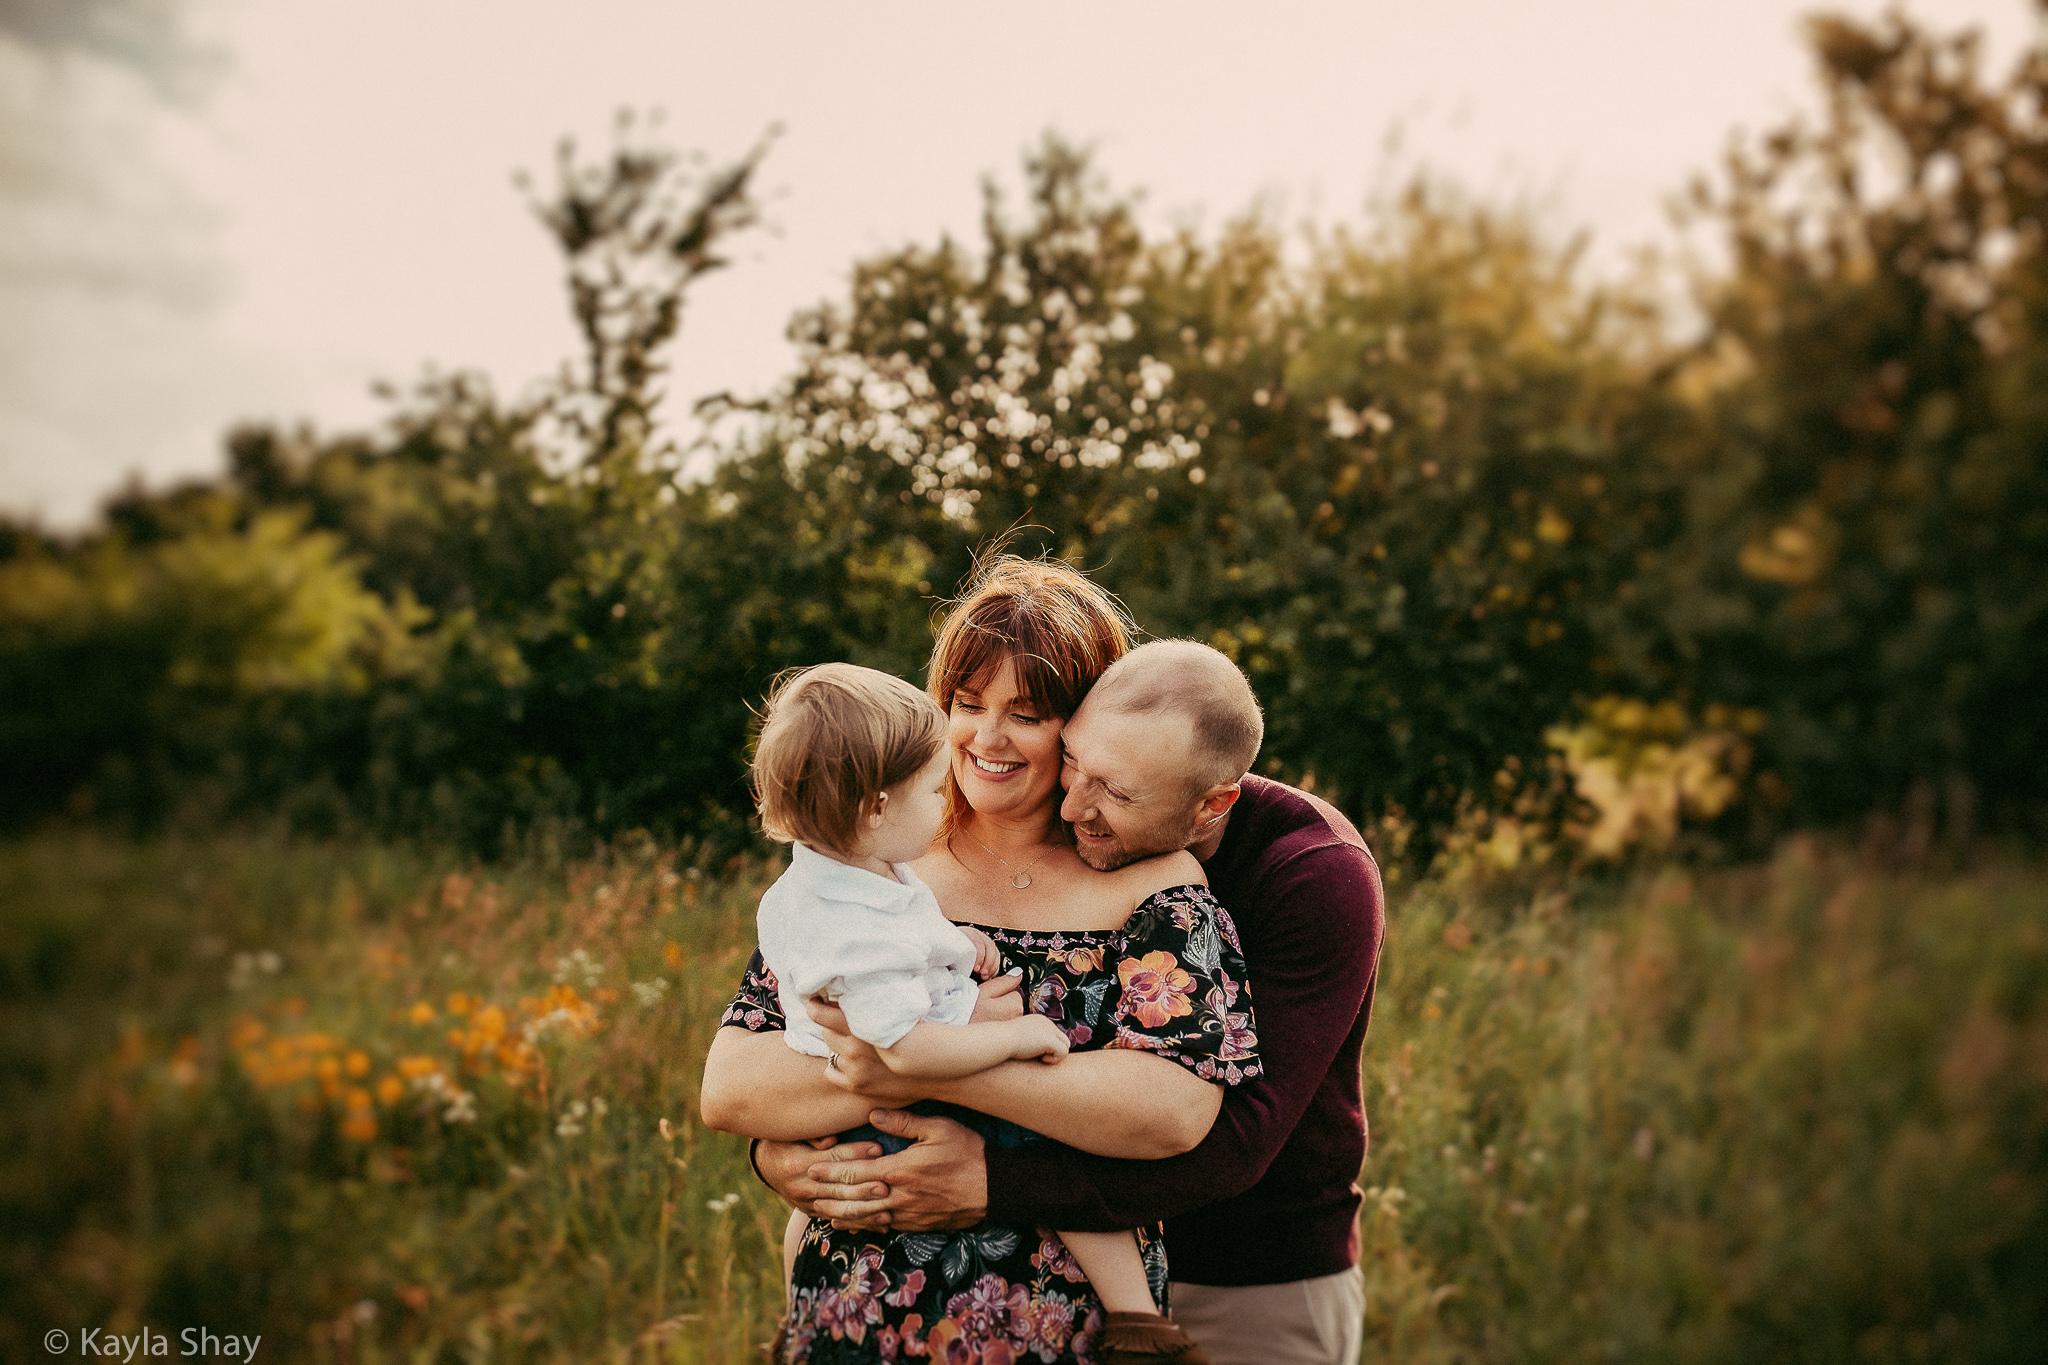 Family Portrait photographer, Lawrence Kansas, Overland park, kansas, ks, lifestyle family session, newborn photographer, olathe, olathe kansas, overbrook kansas, portraits, studio photographer